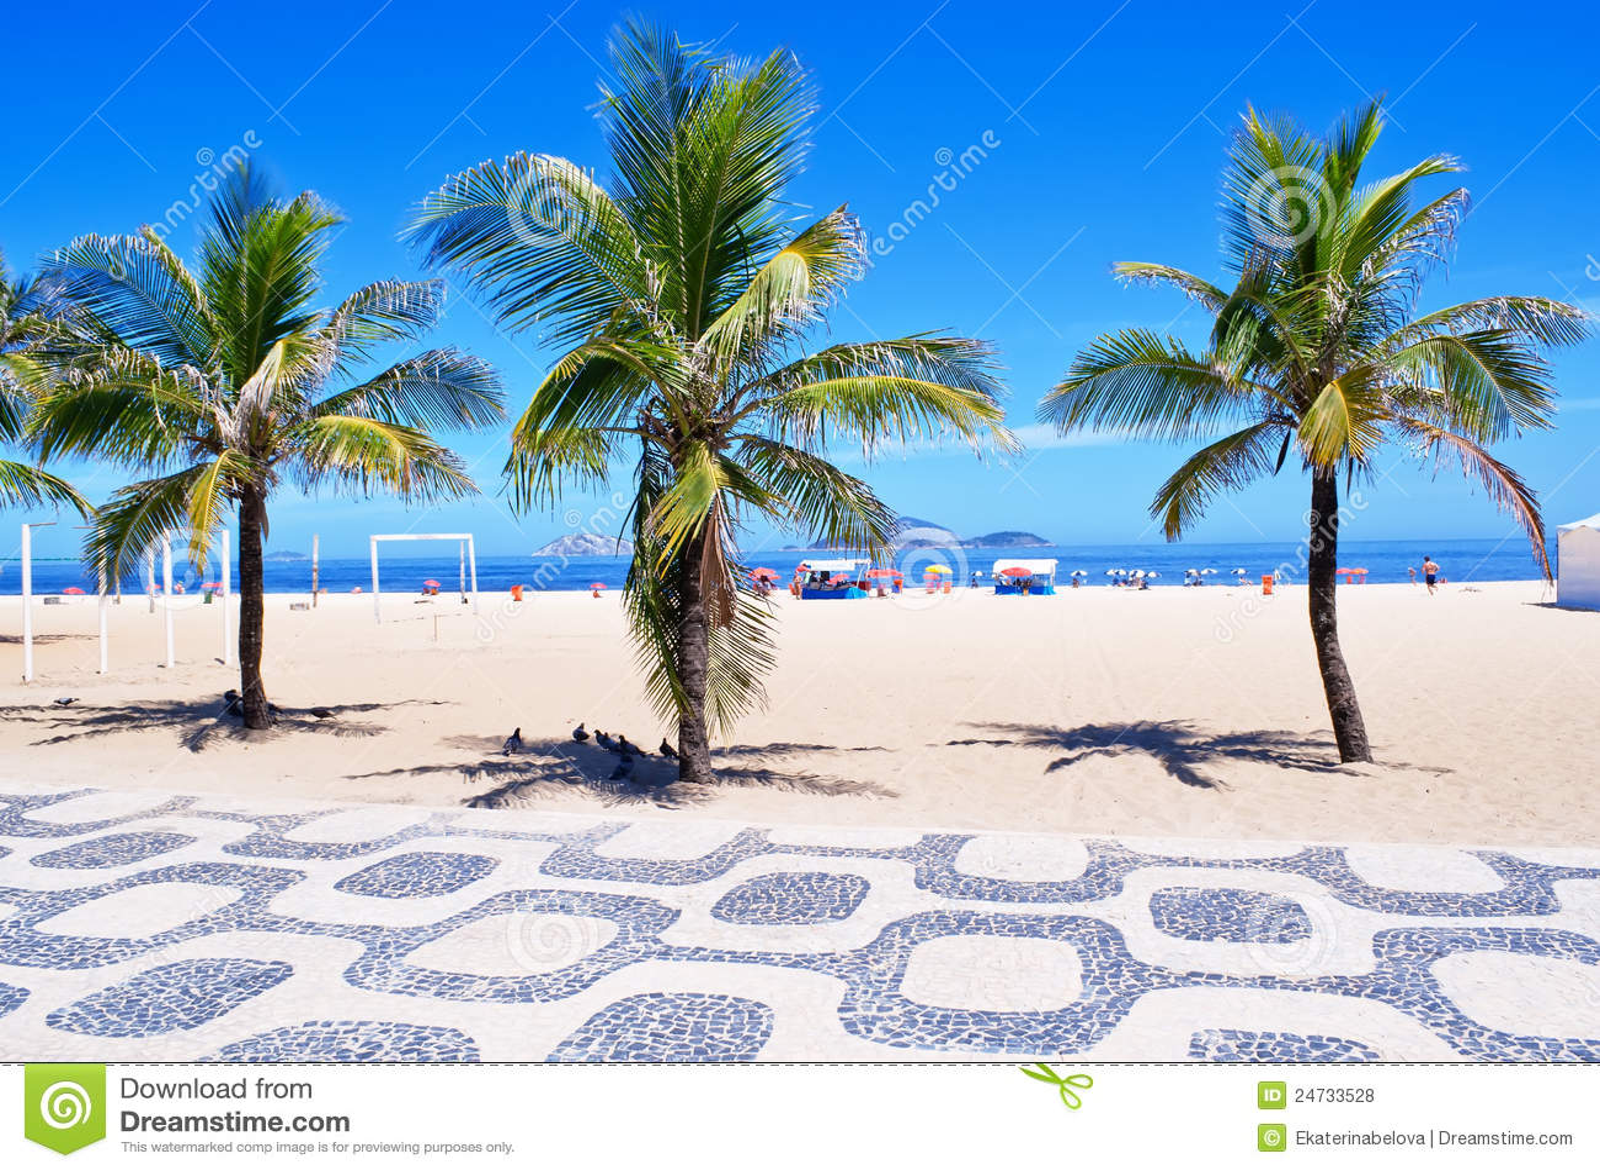 Ipanema beach with palms and mosaic of sid